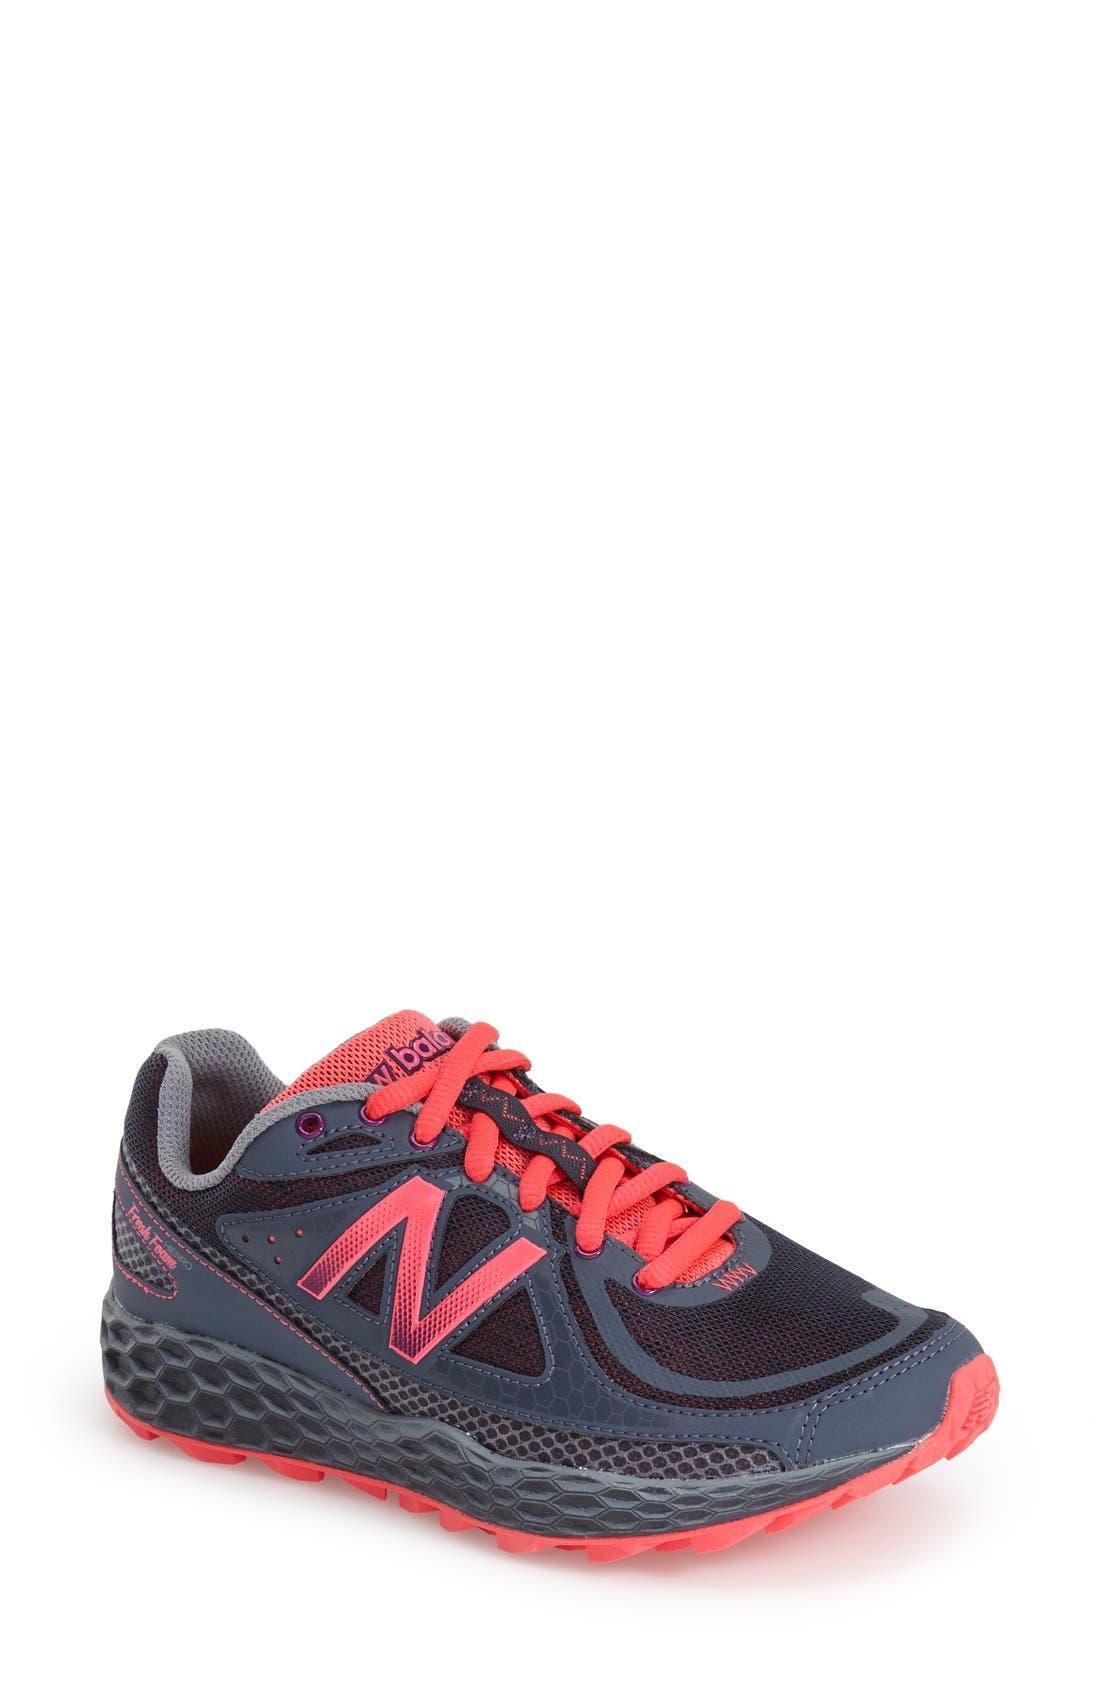 Main Image - New Balance 'Fresh Foam Hierro' Trail Running Shoe (Women)